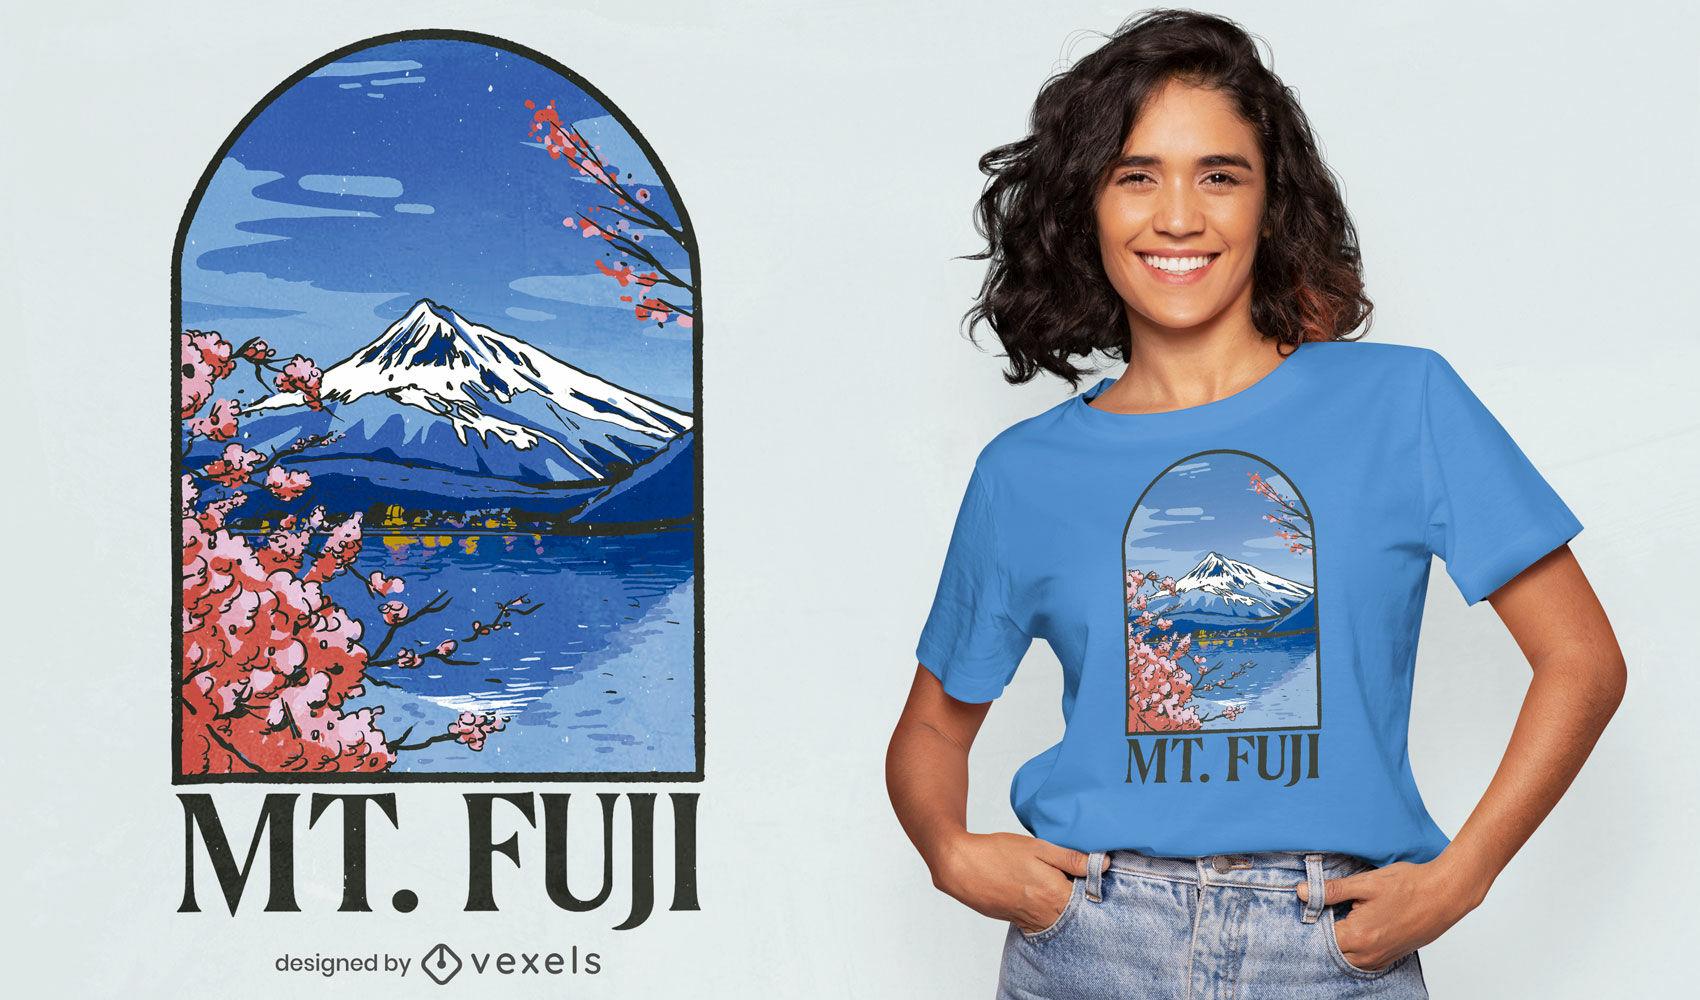 Hermoso dise?o de camiseta de Mt Fuji